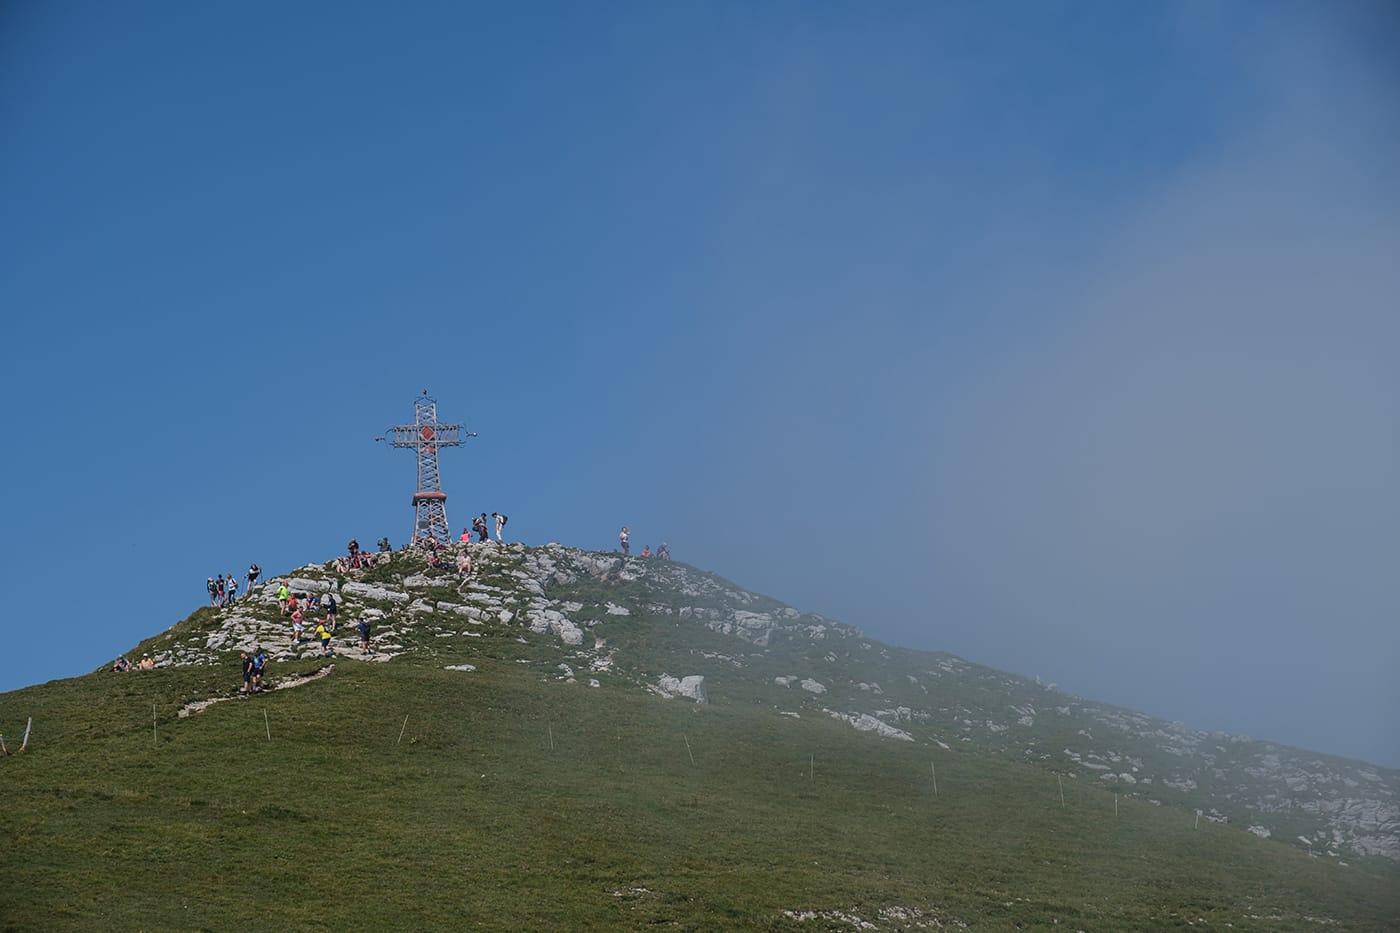 Croix sommet du reculet Jura